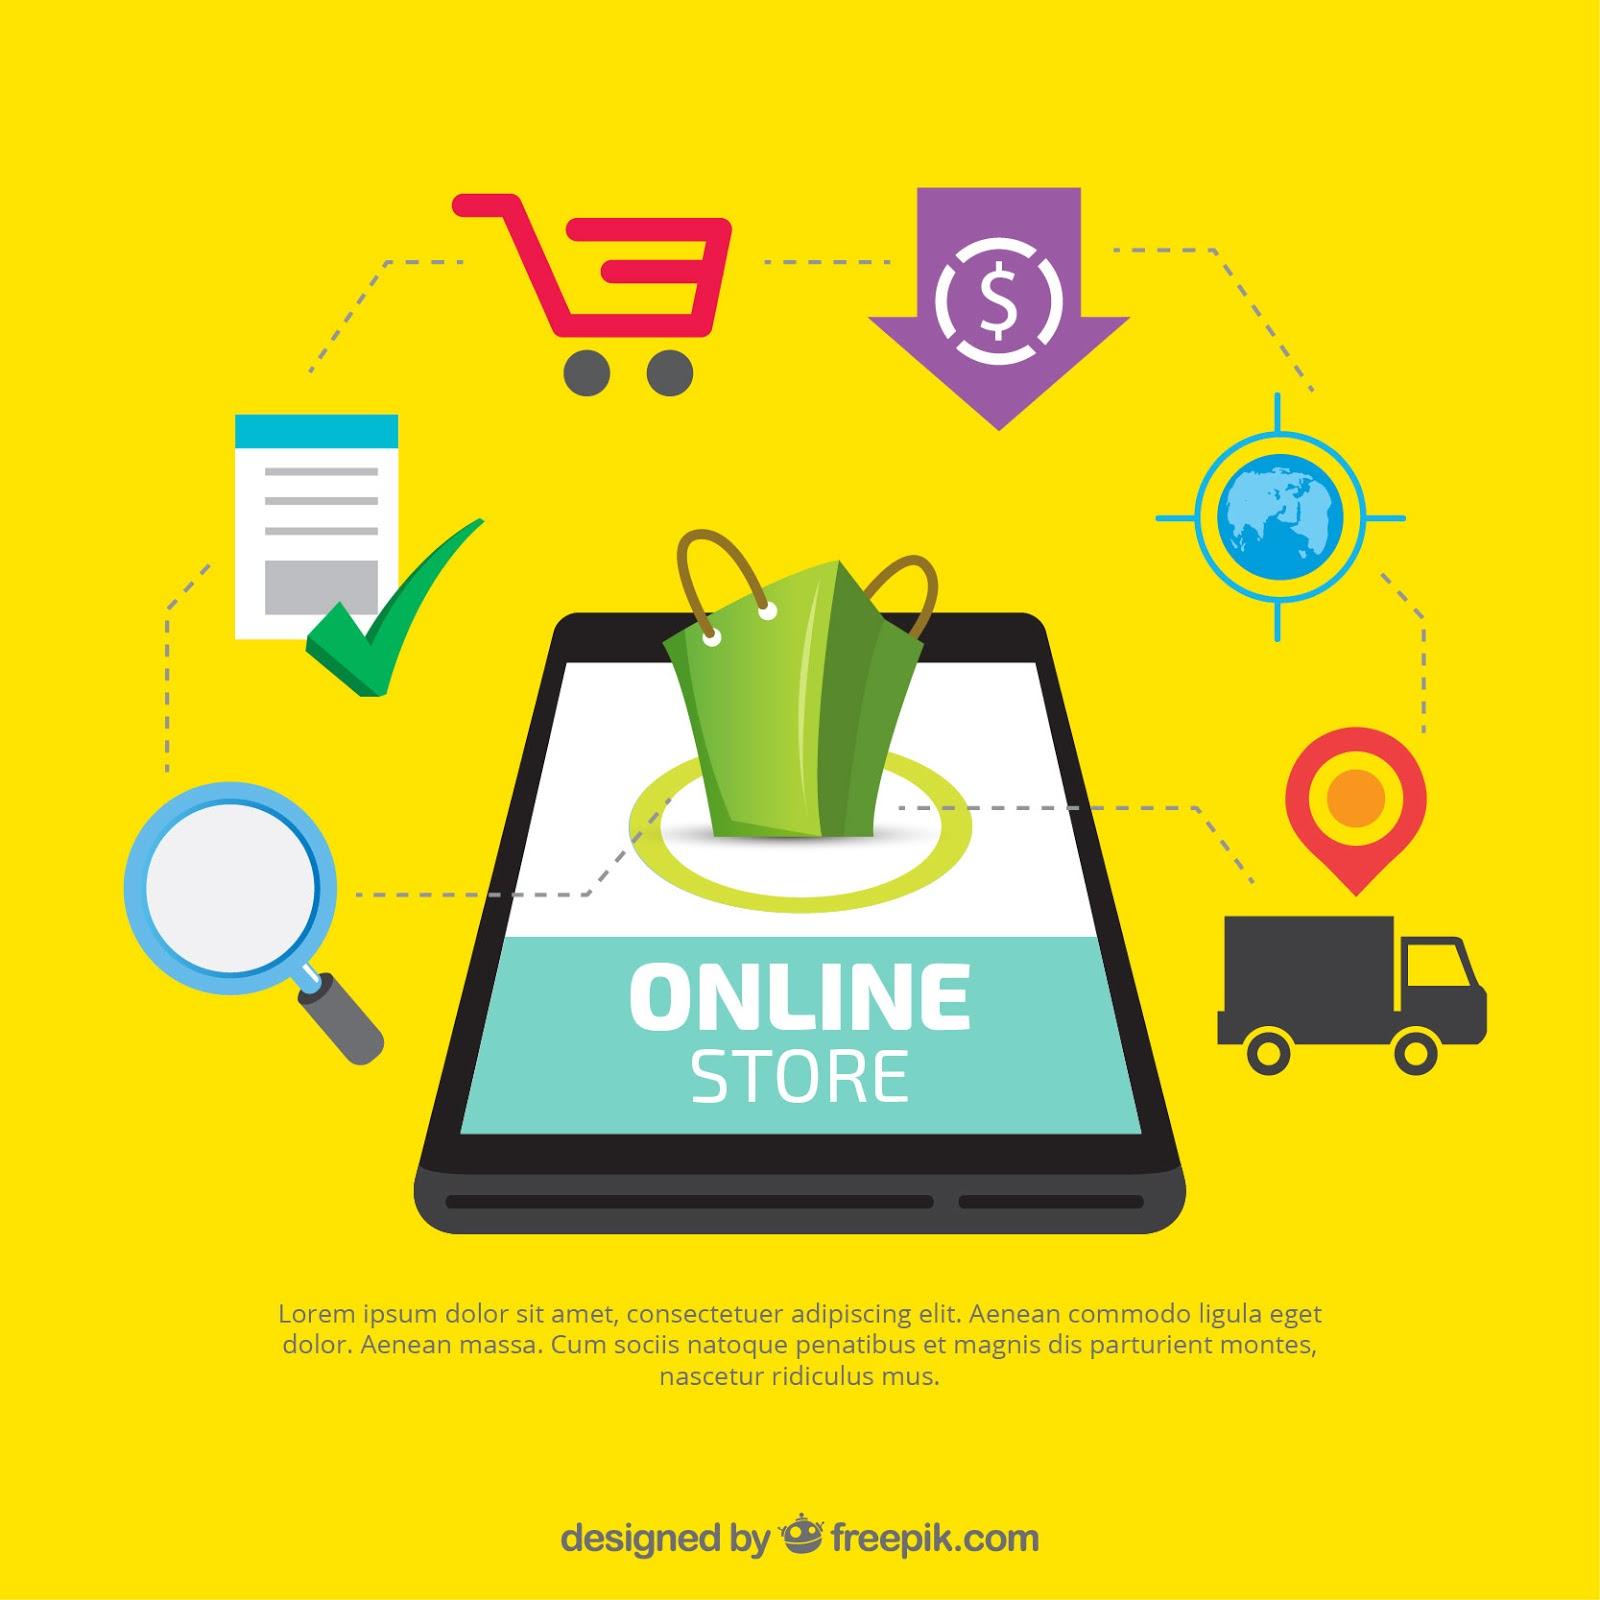 Syarat dan ketentuan menjadi publisher affiliasi online for Online store for shopping